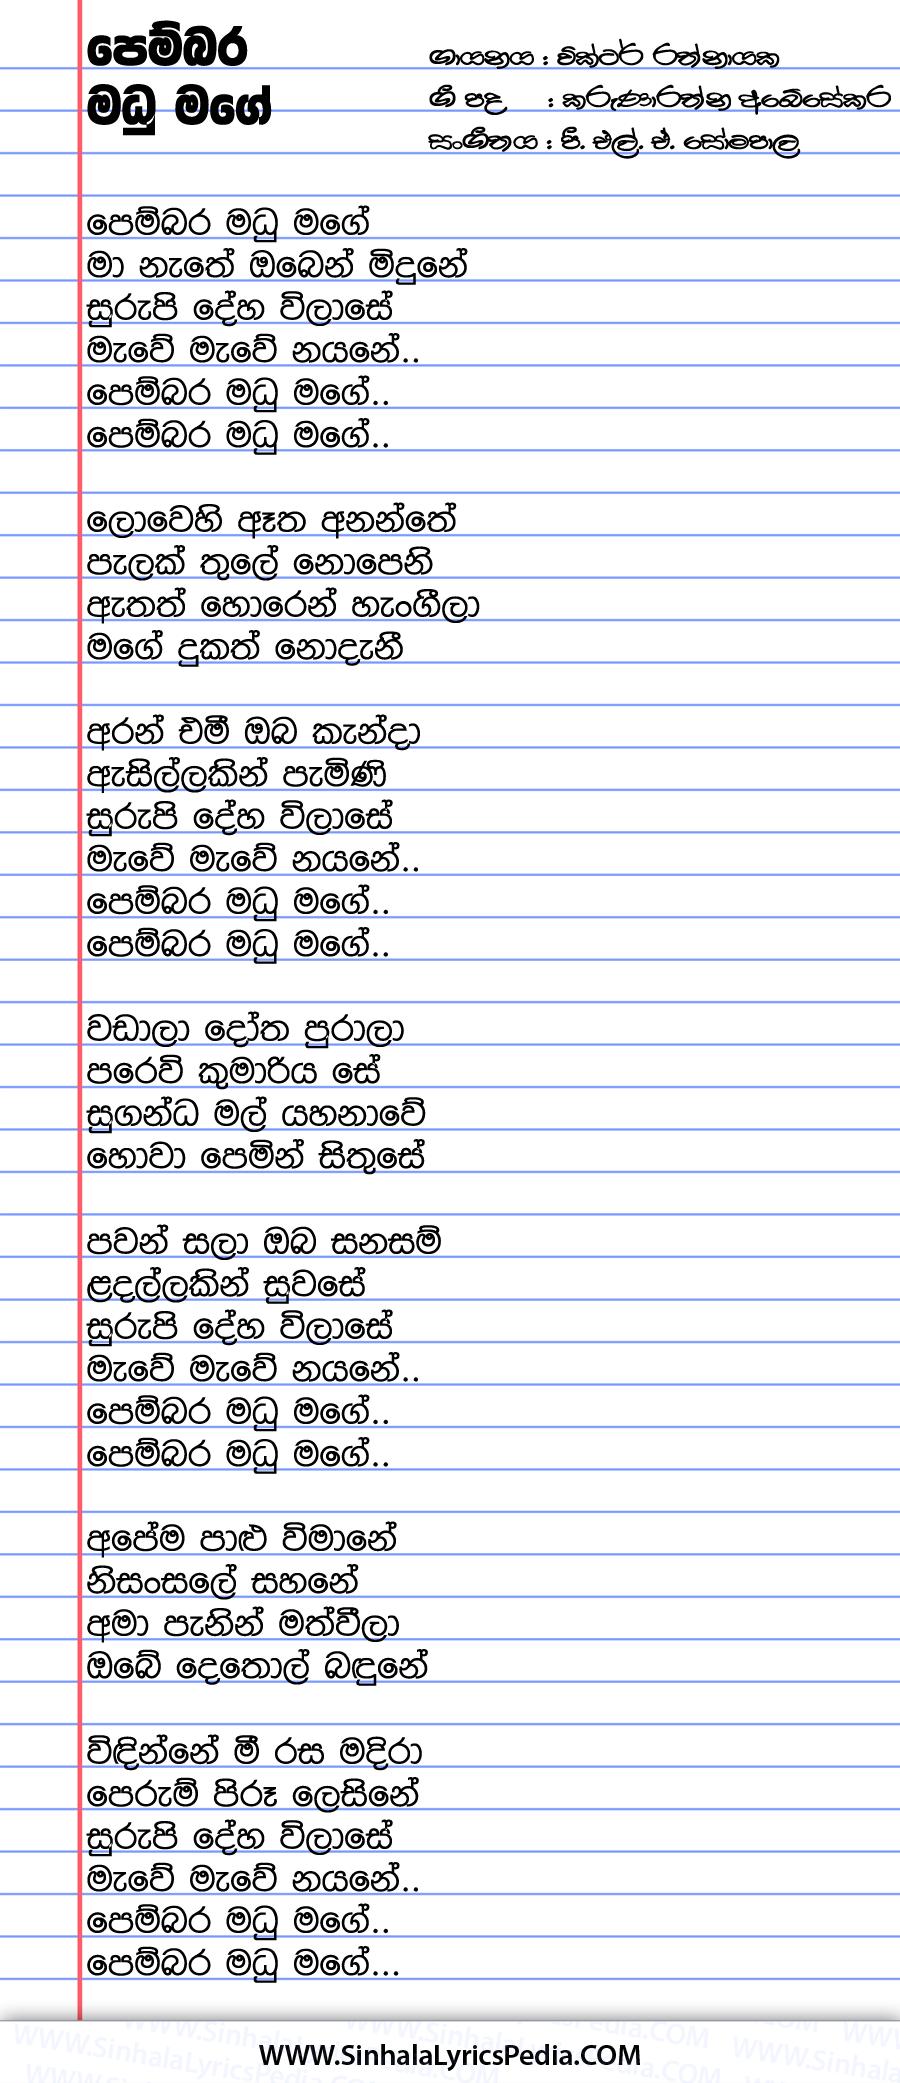 Pembara Madu Mage Song Lyrics